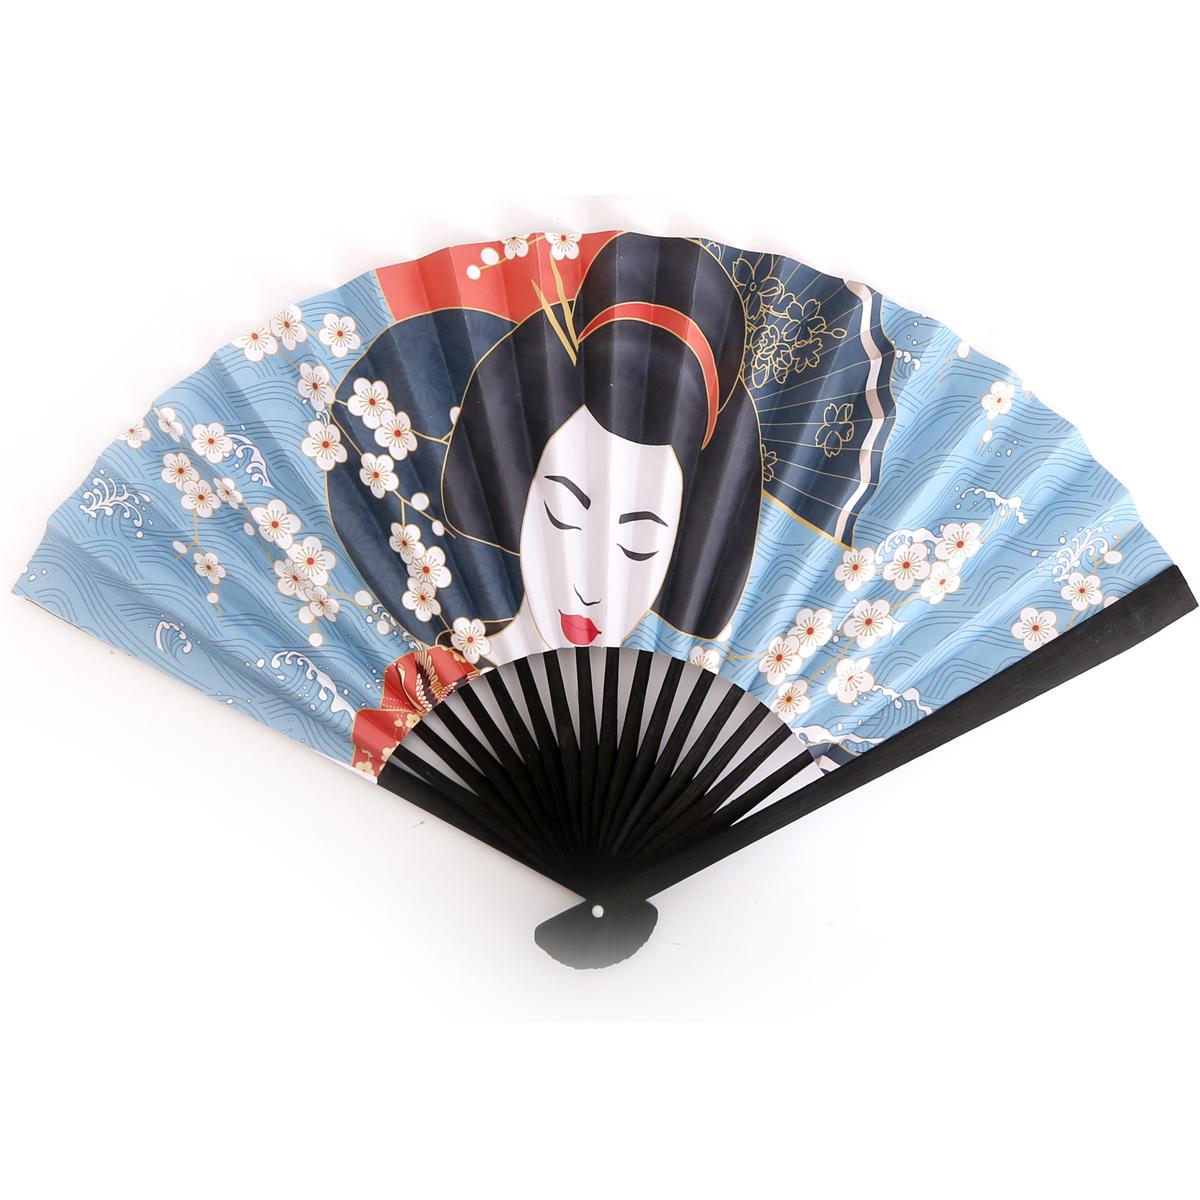 Eventail papier \'Geisha\' bleu noir - ouvert 37x21 cm - [R0841]